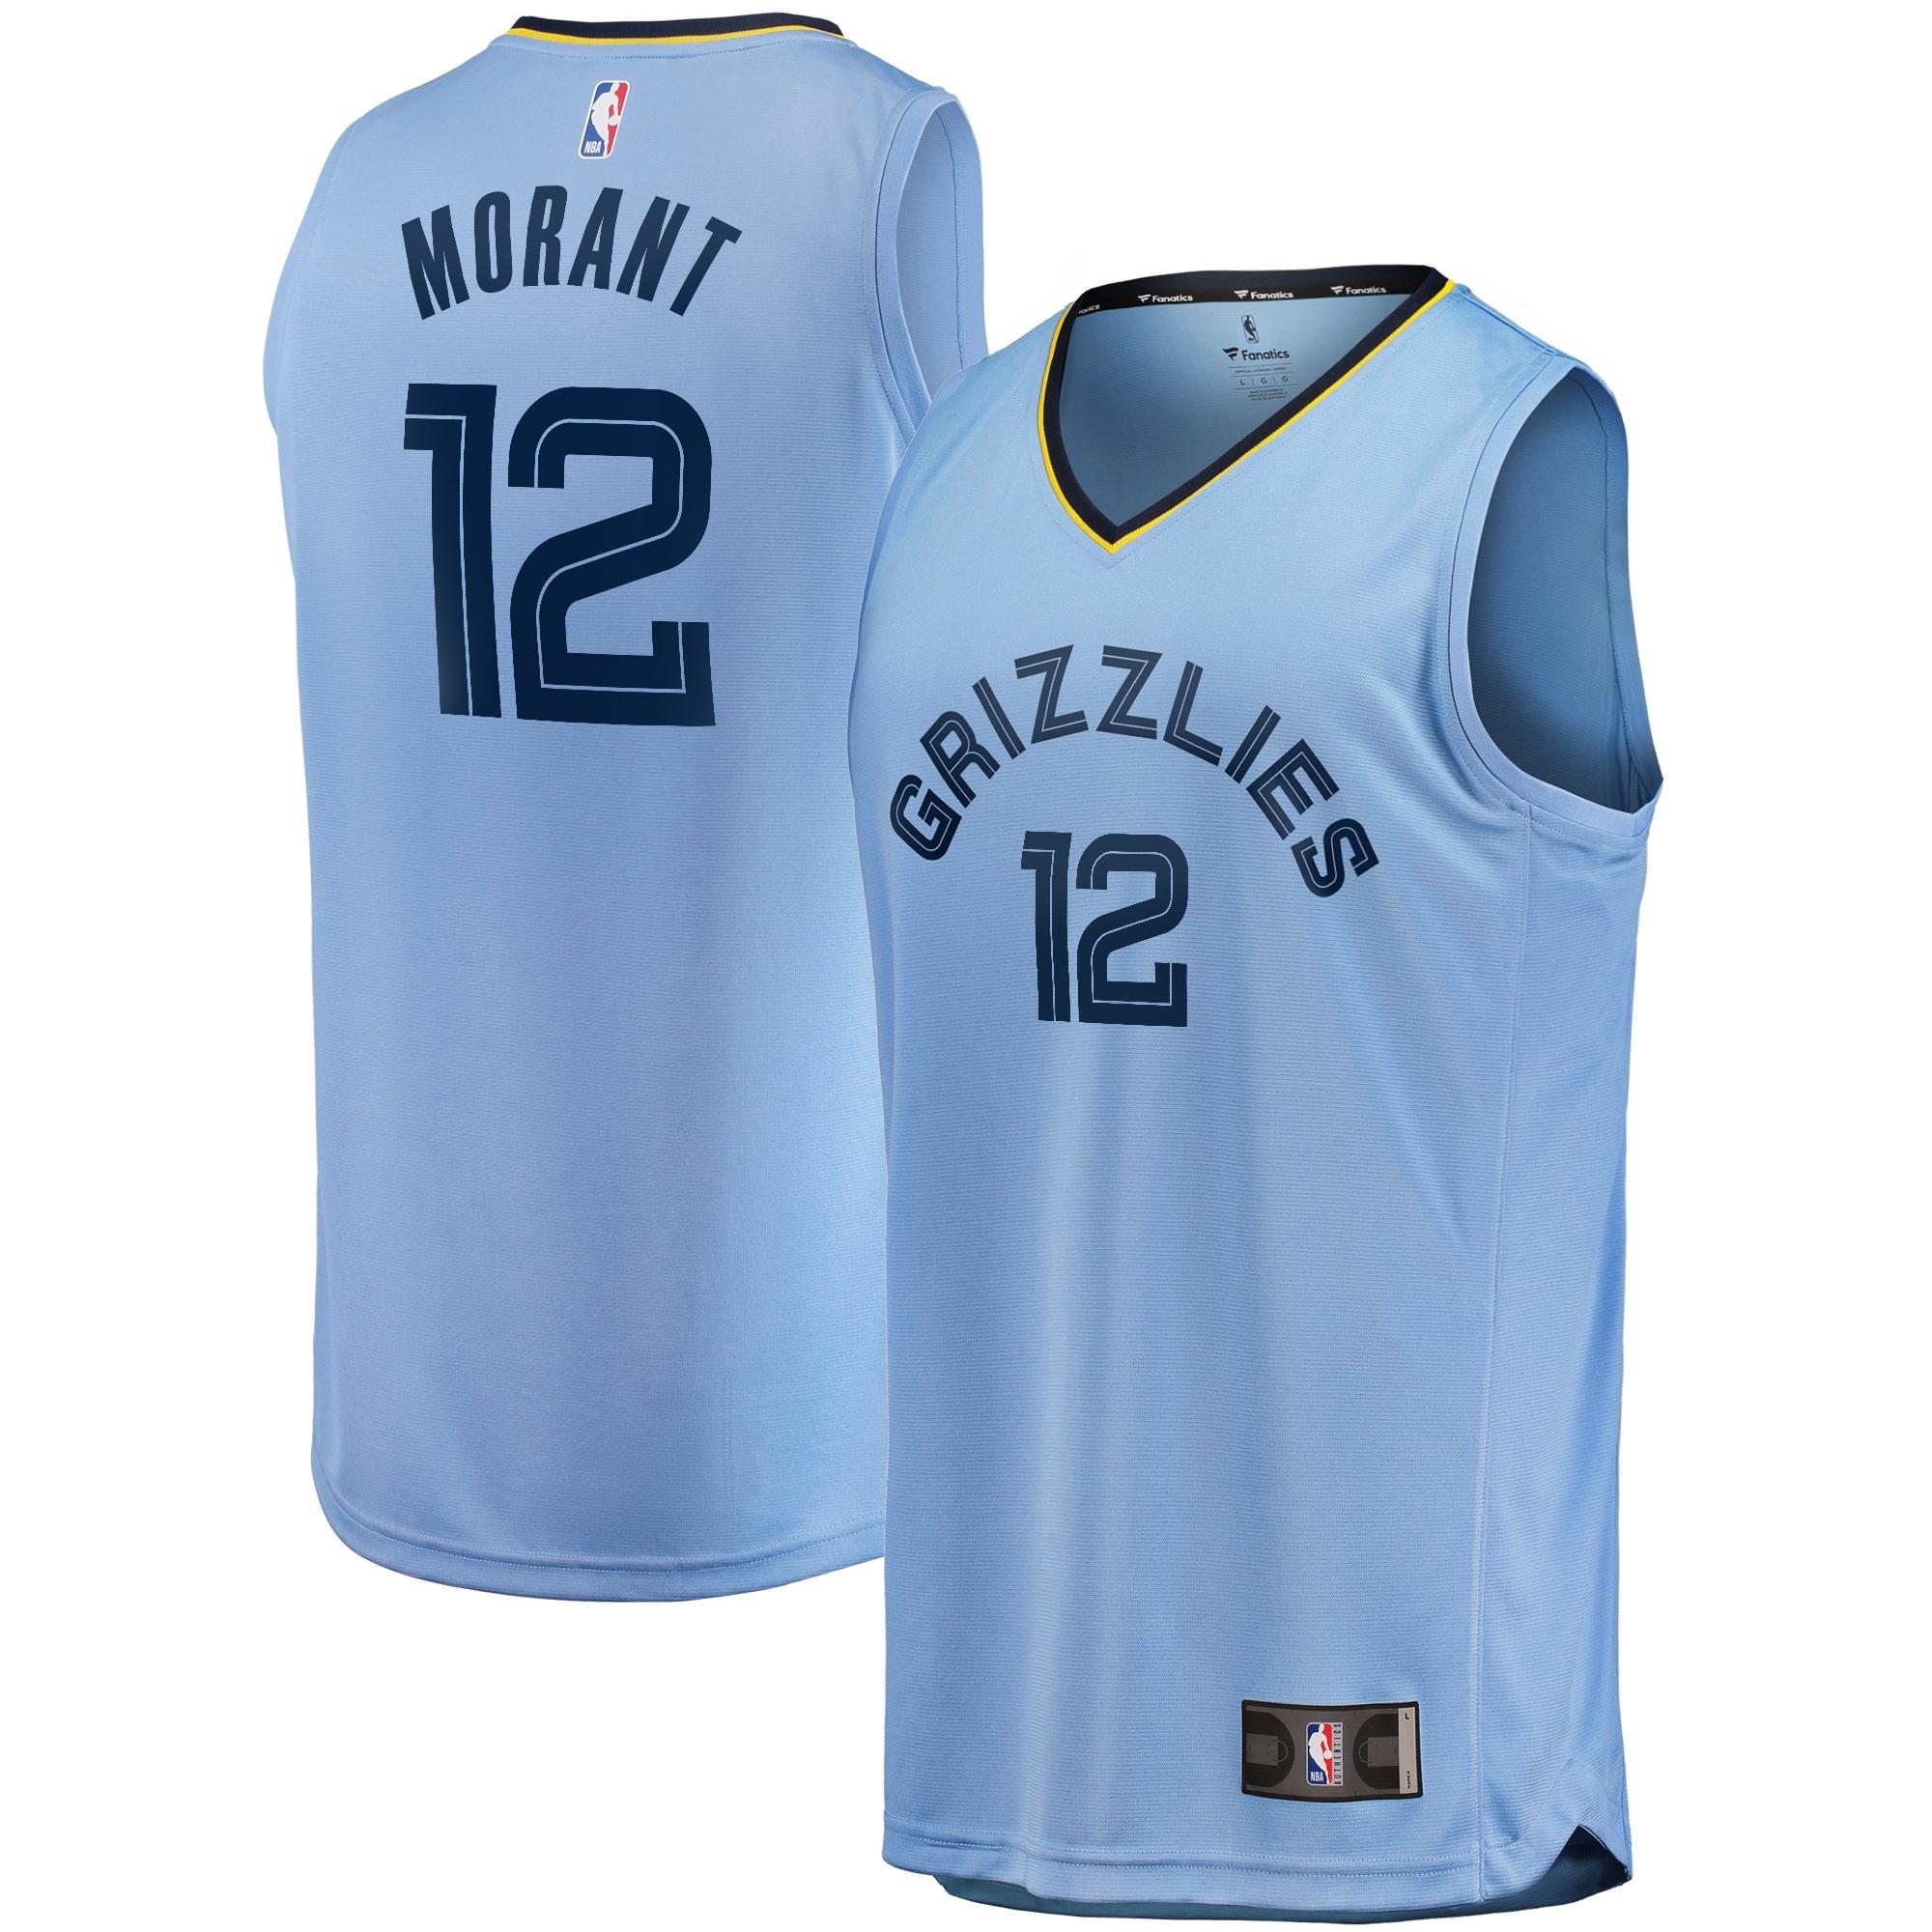 Ja Morant Memphis Grizzlies Fanatics Branded Youth Fast Break Player Replica Jersey - Statement Edition - Light Blue